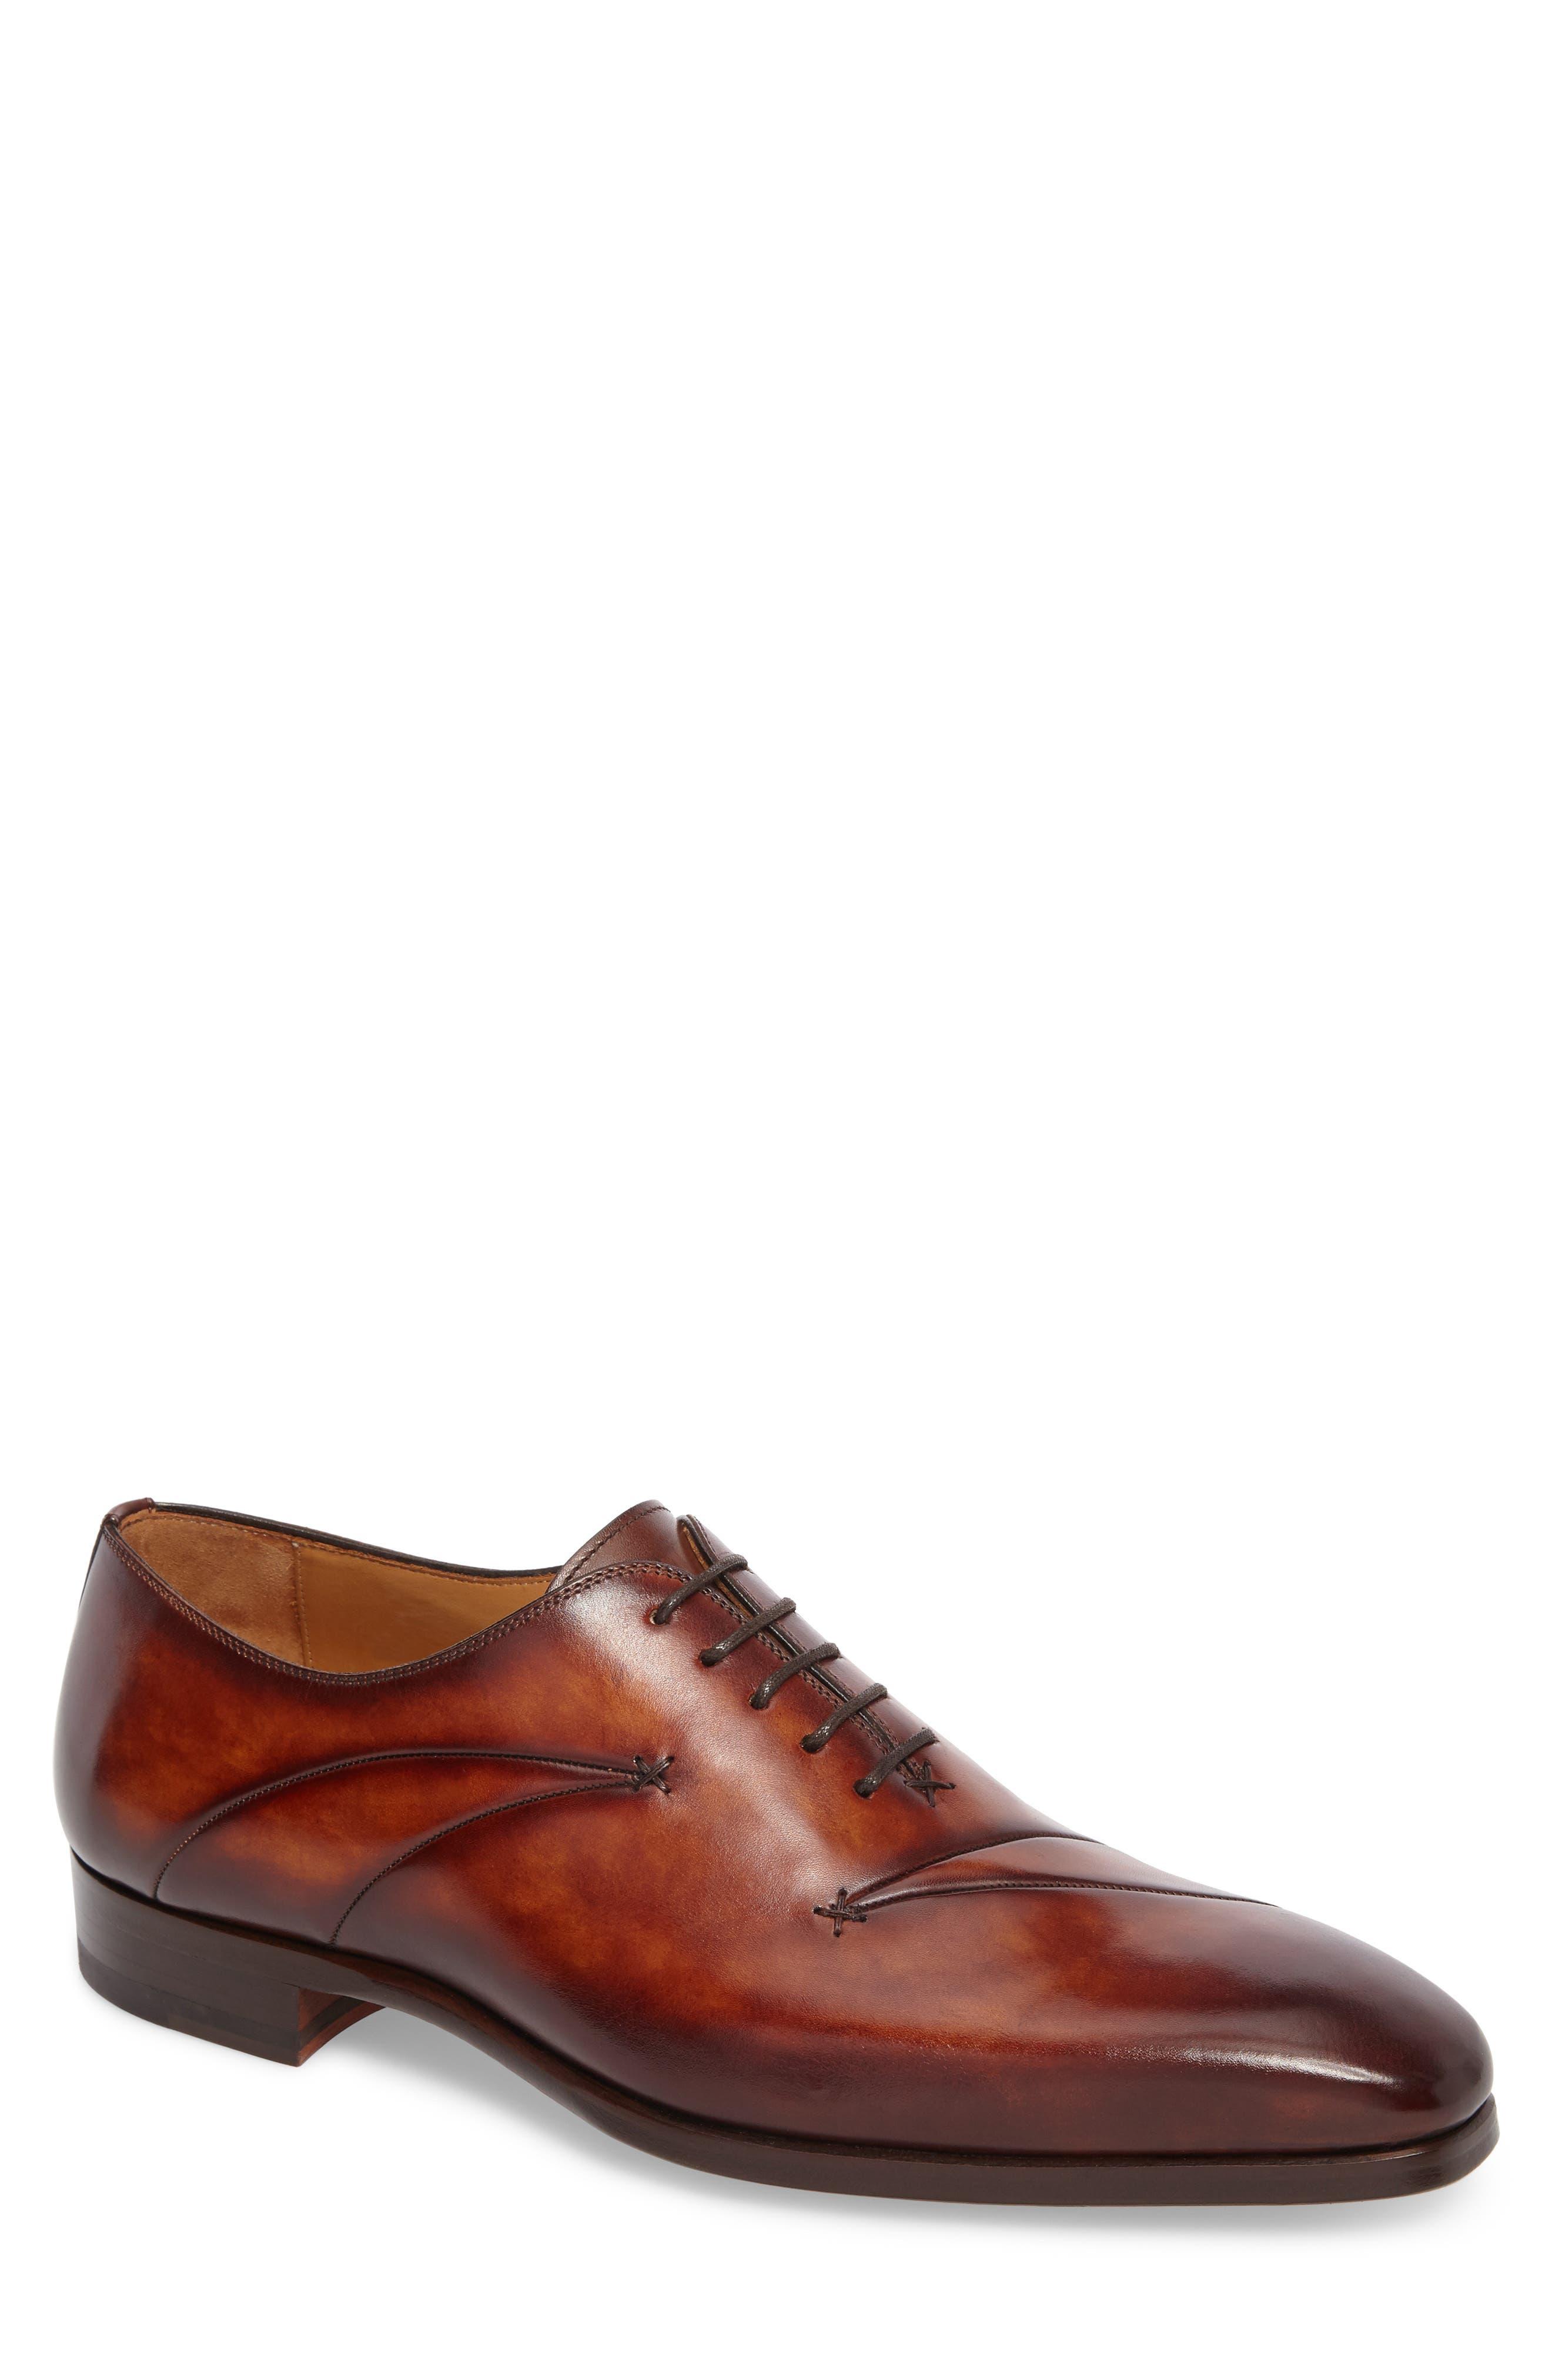 Marquez Stitched Oxford,                         Main,                         color, 219